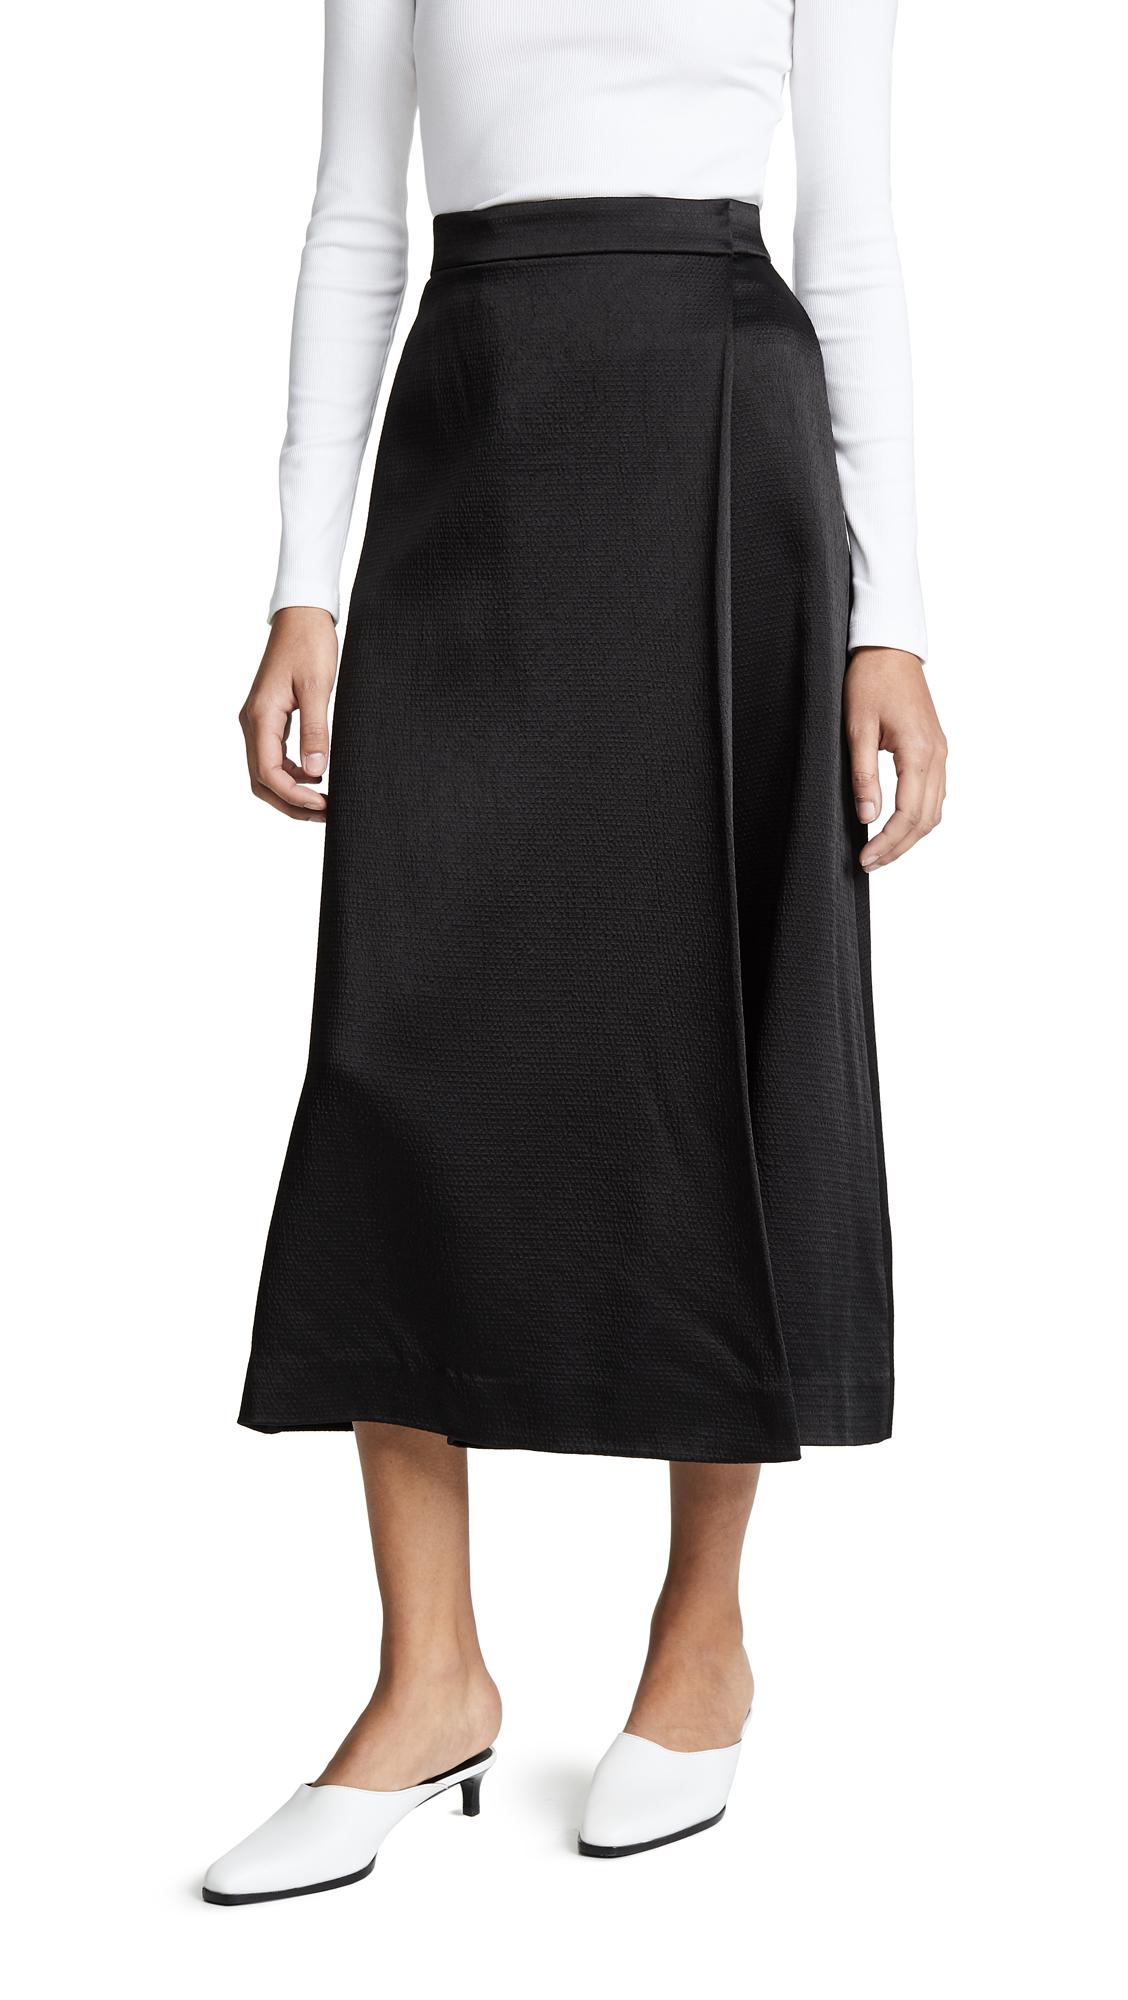 Theory Skirt Pants - Black